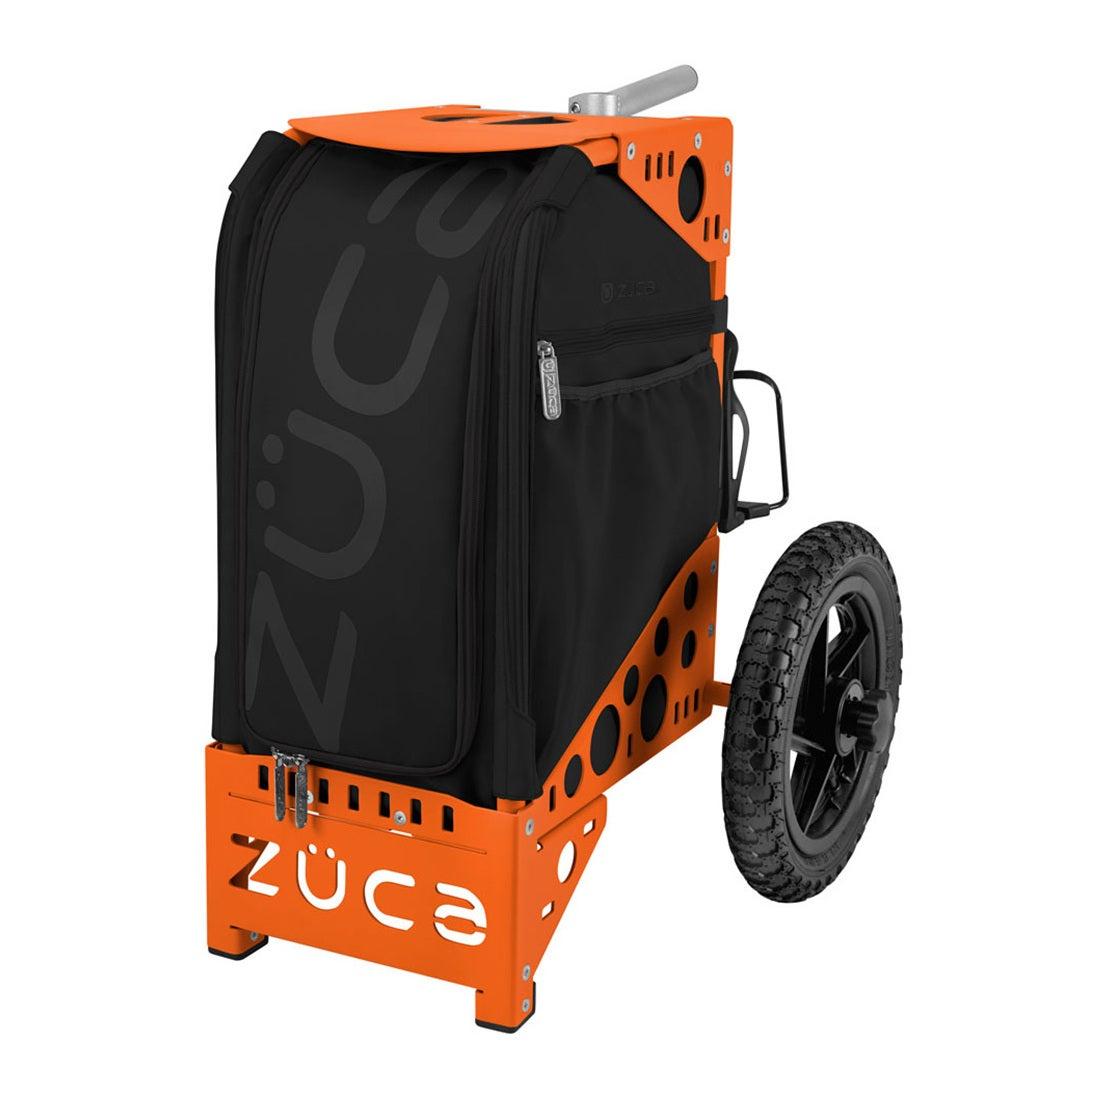 【SAC'S BAR】ズーカ ZUCA キャリーケース 1310 ALL-TERRAIN Covert/Orange メンズ